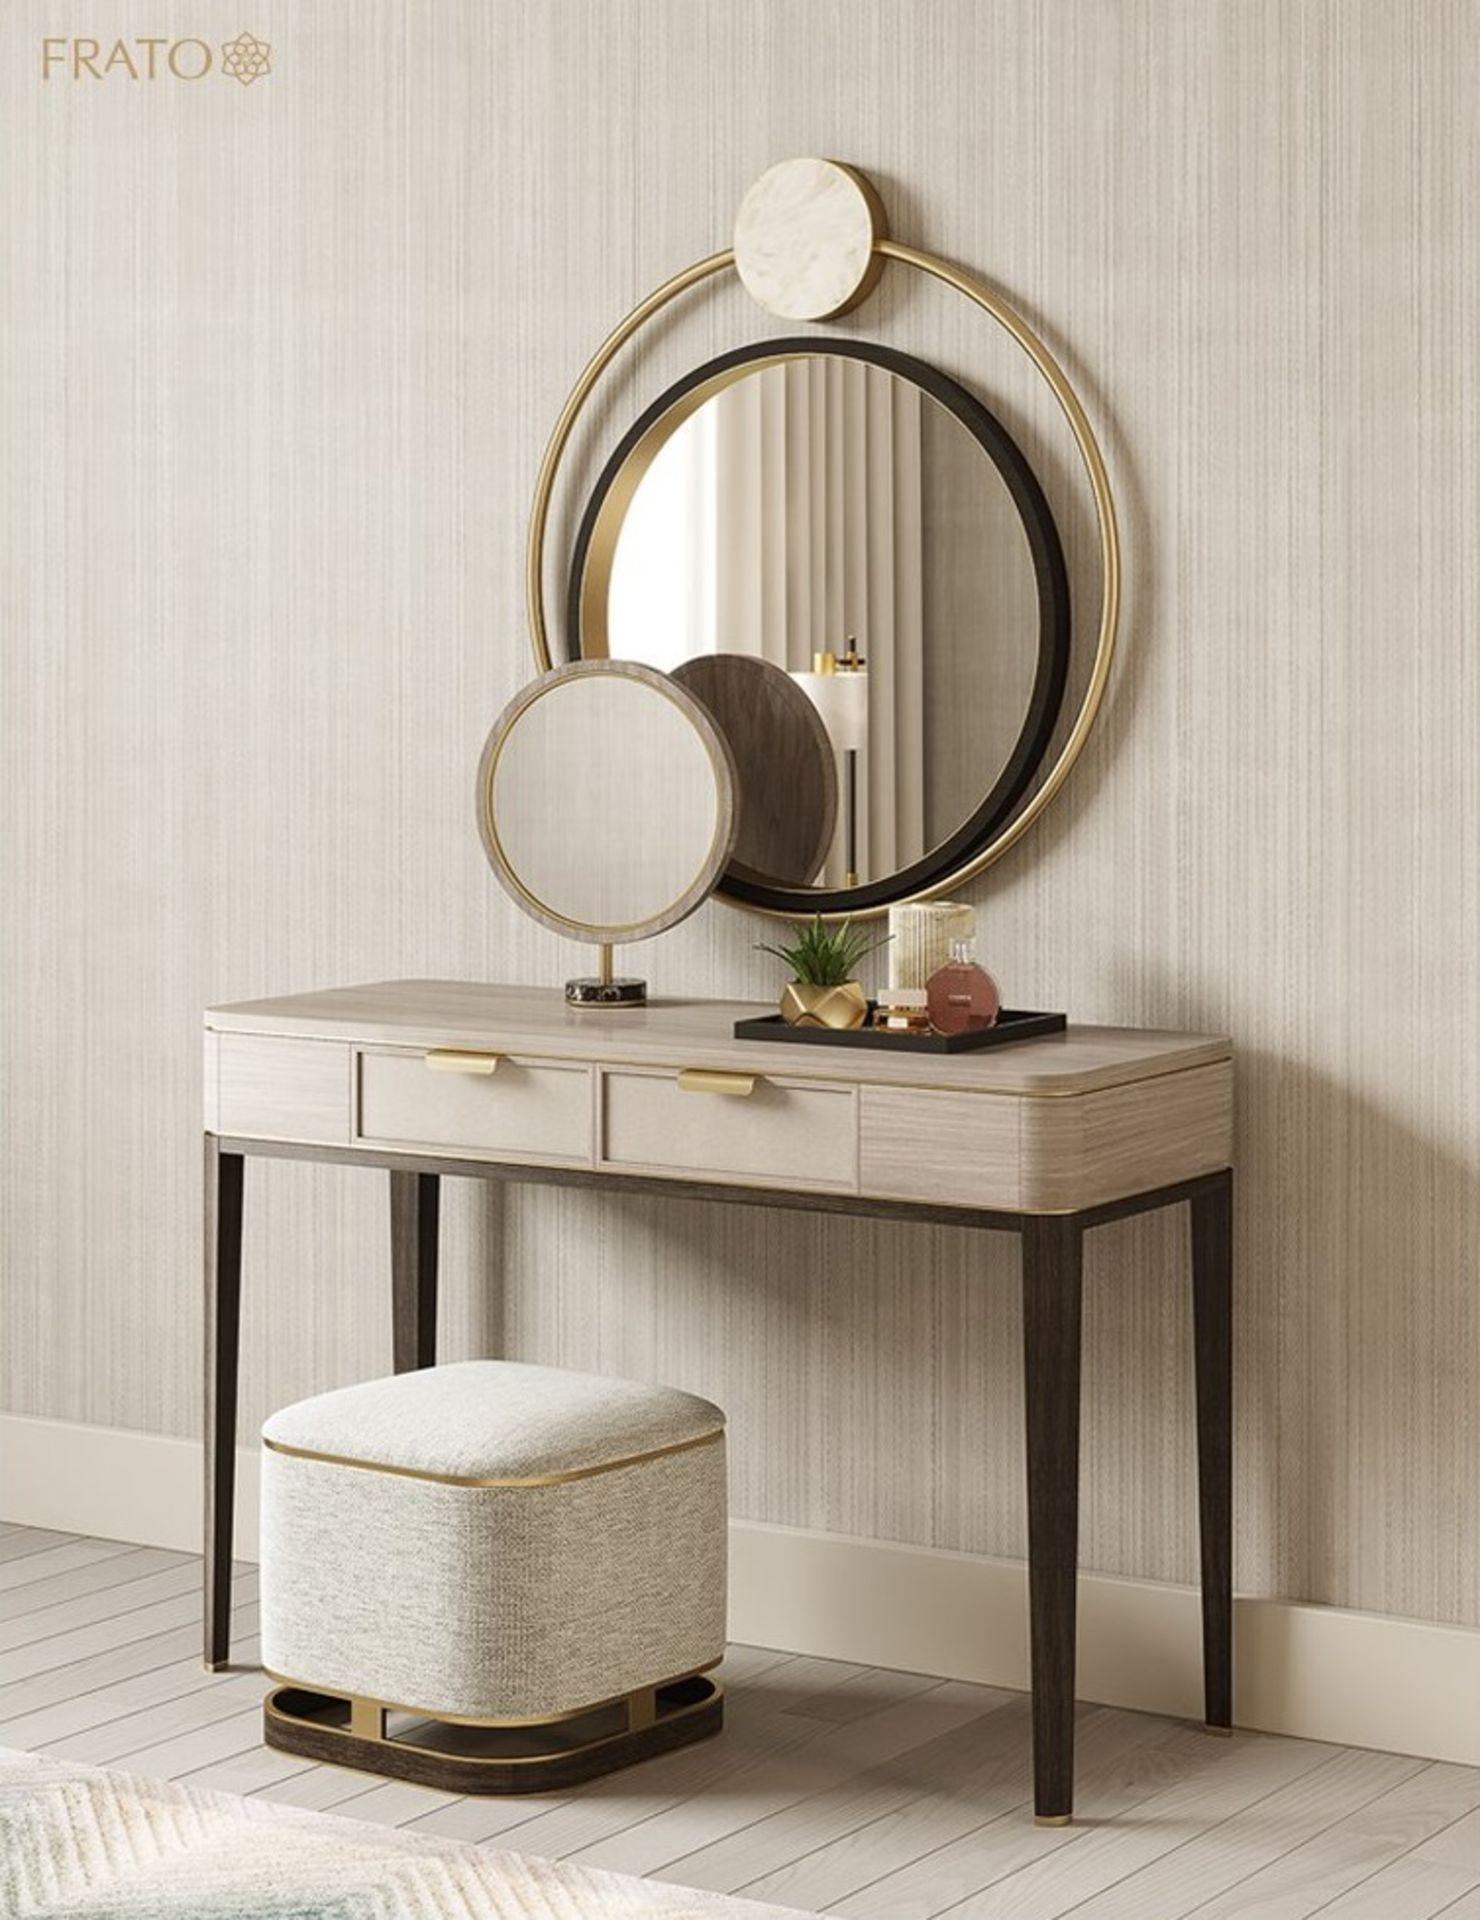 1 x FRATO 'Mandalay' Luxury Designer 2-Drawer Dresser Dressing Table In A Gloss Finish - RRP £4,300